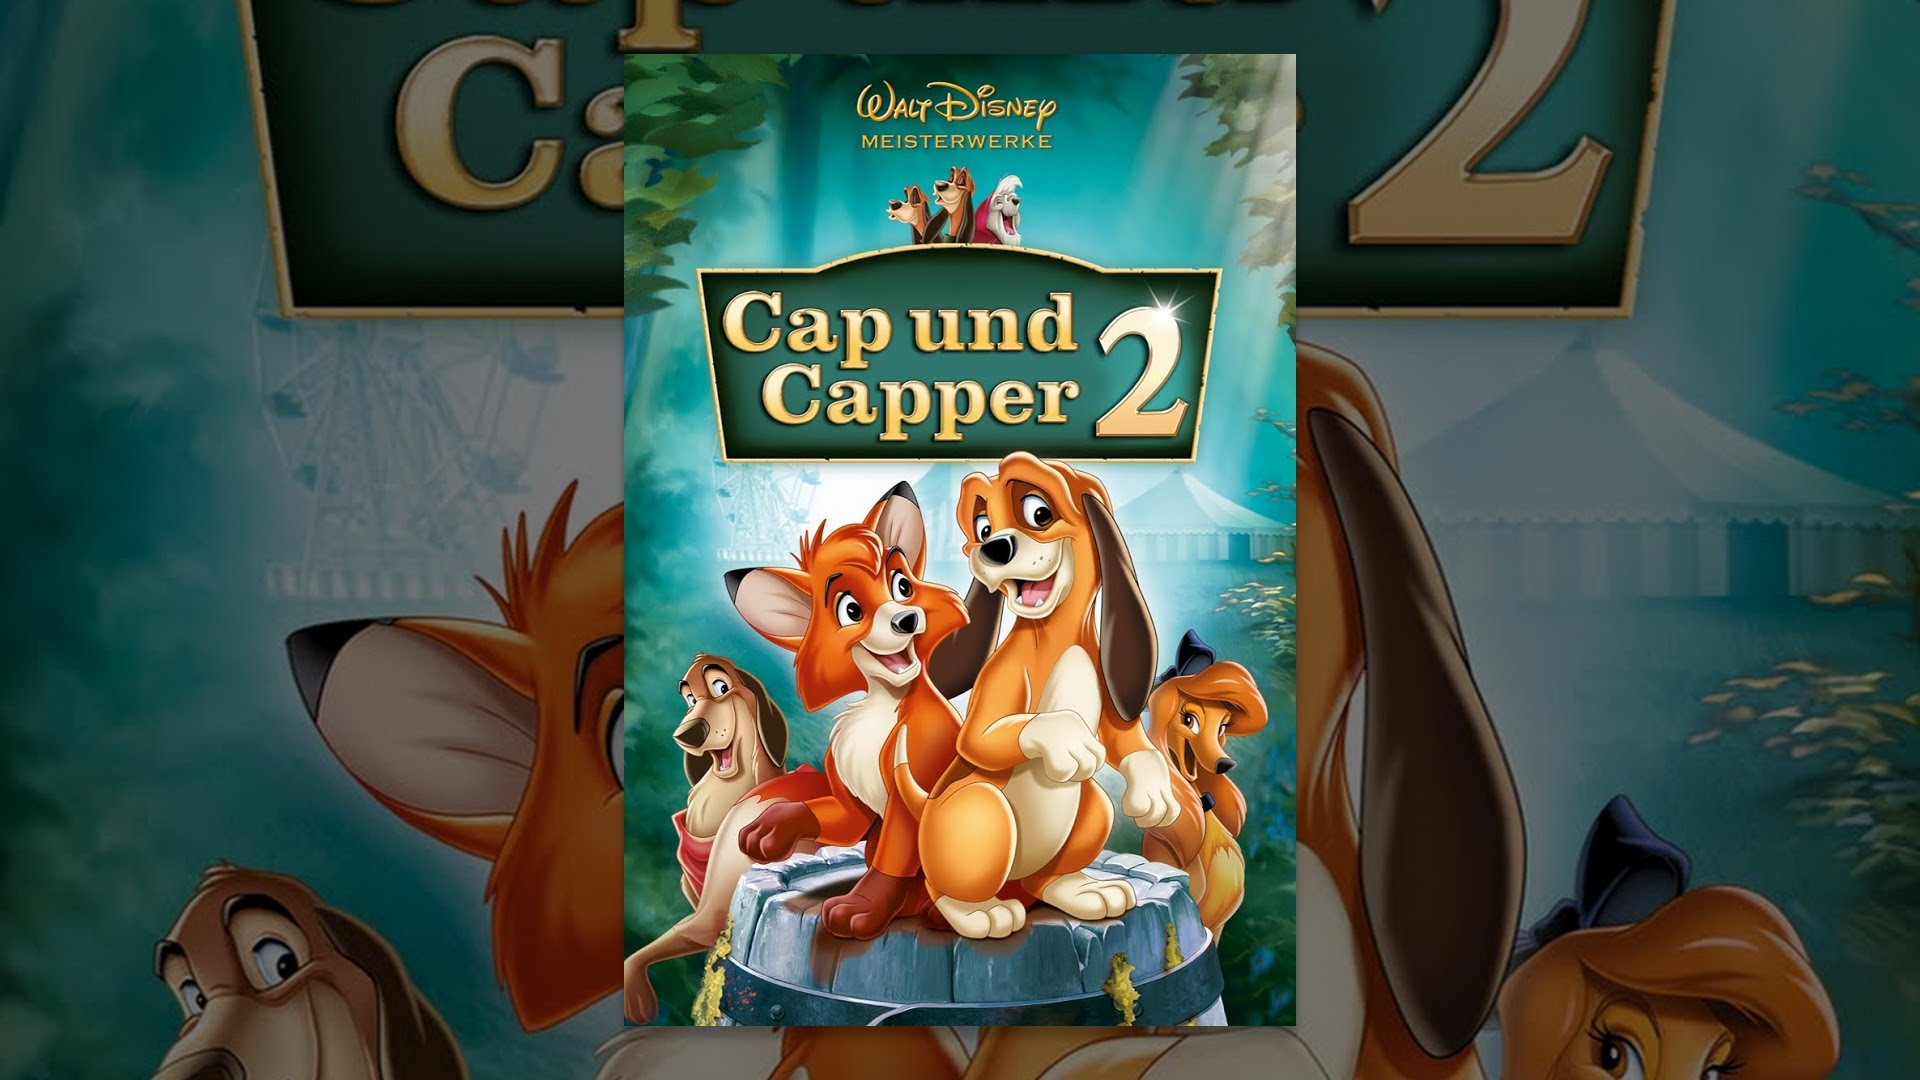 Download Cap Und Capper 2 Film Deutsch Mp4 3gp Naijagreenmovies Netnaija Fzmovies